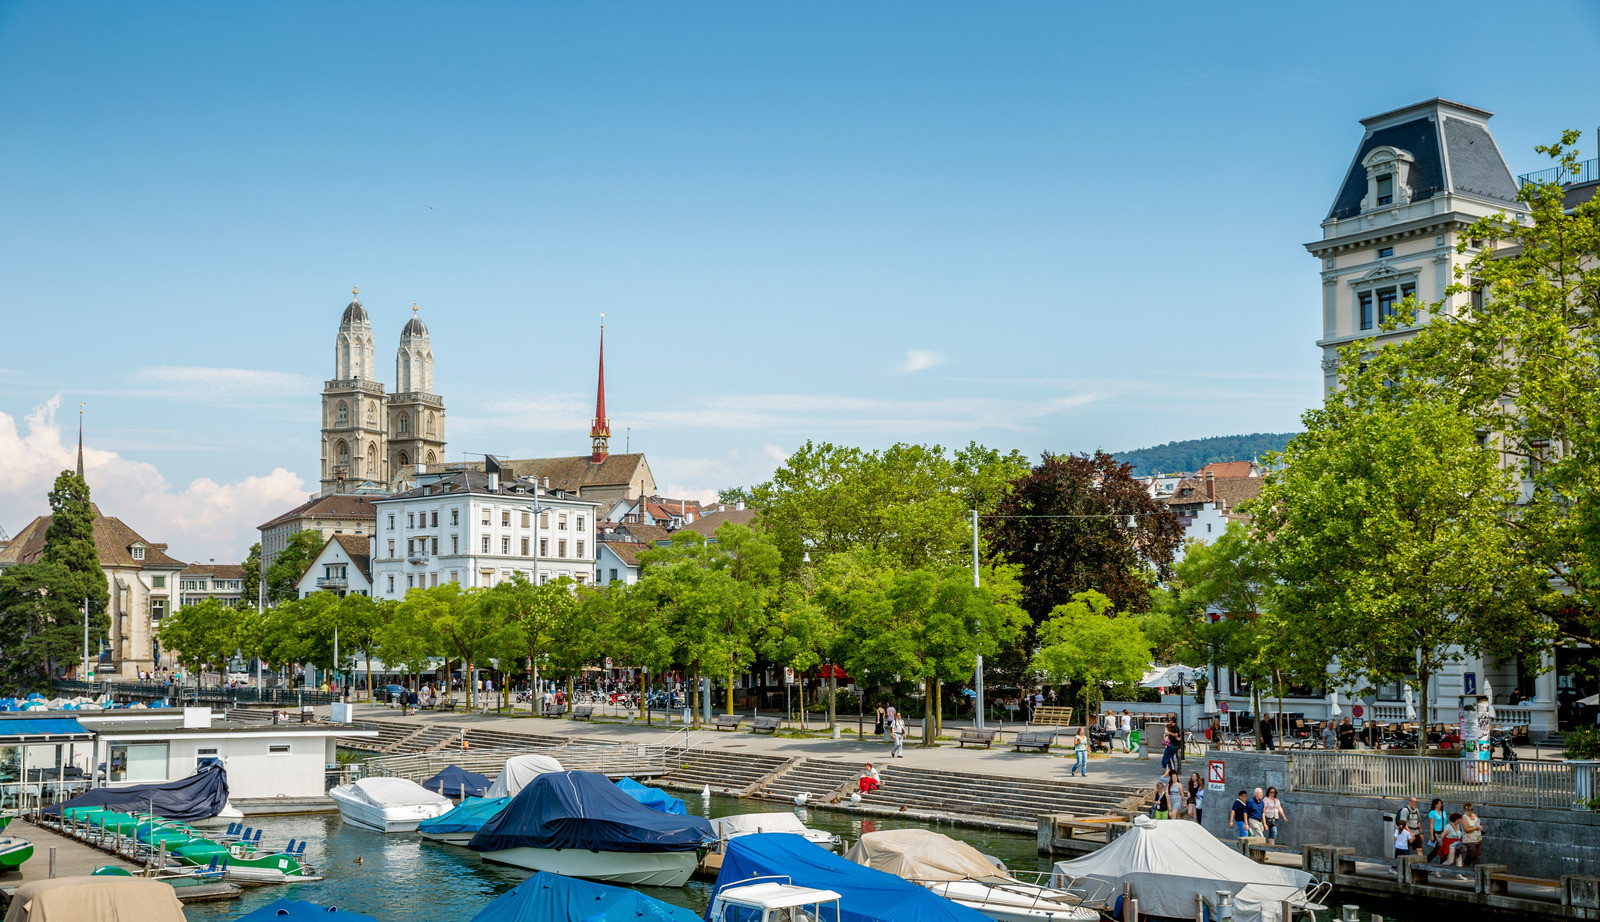 Canva - Cityscape of Zurich.jpg